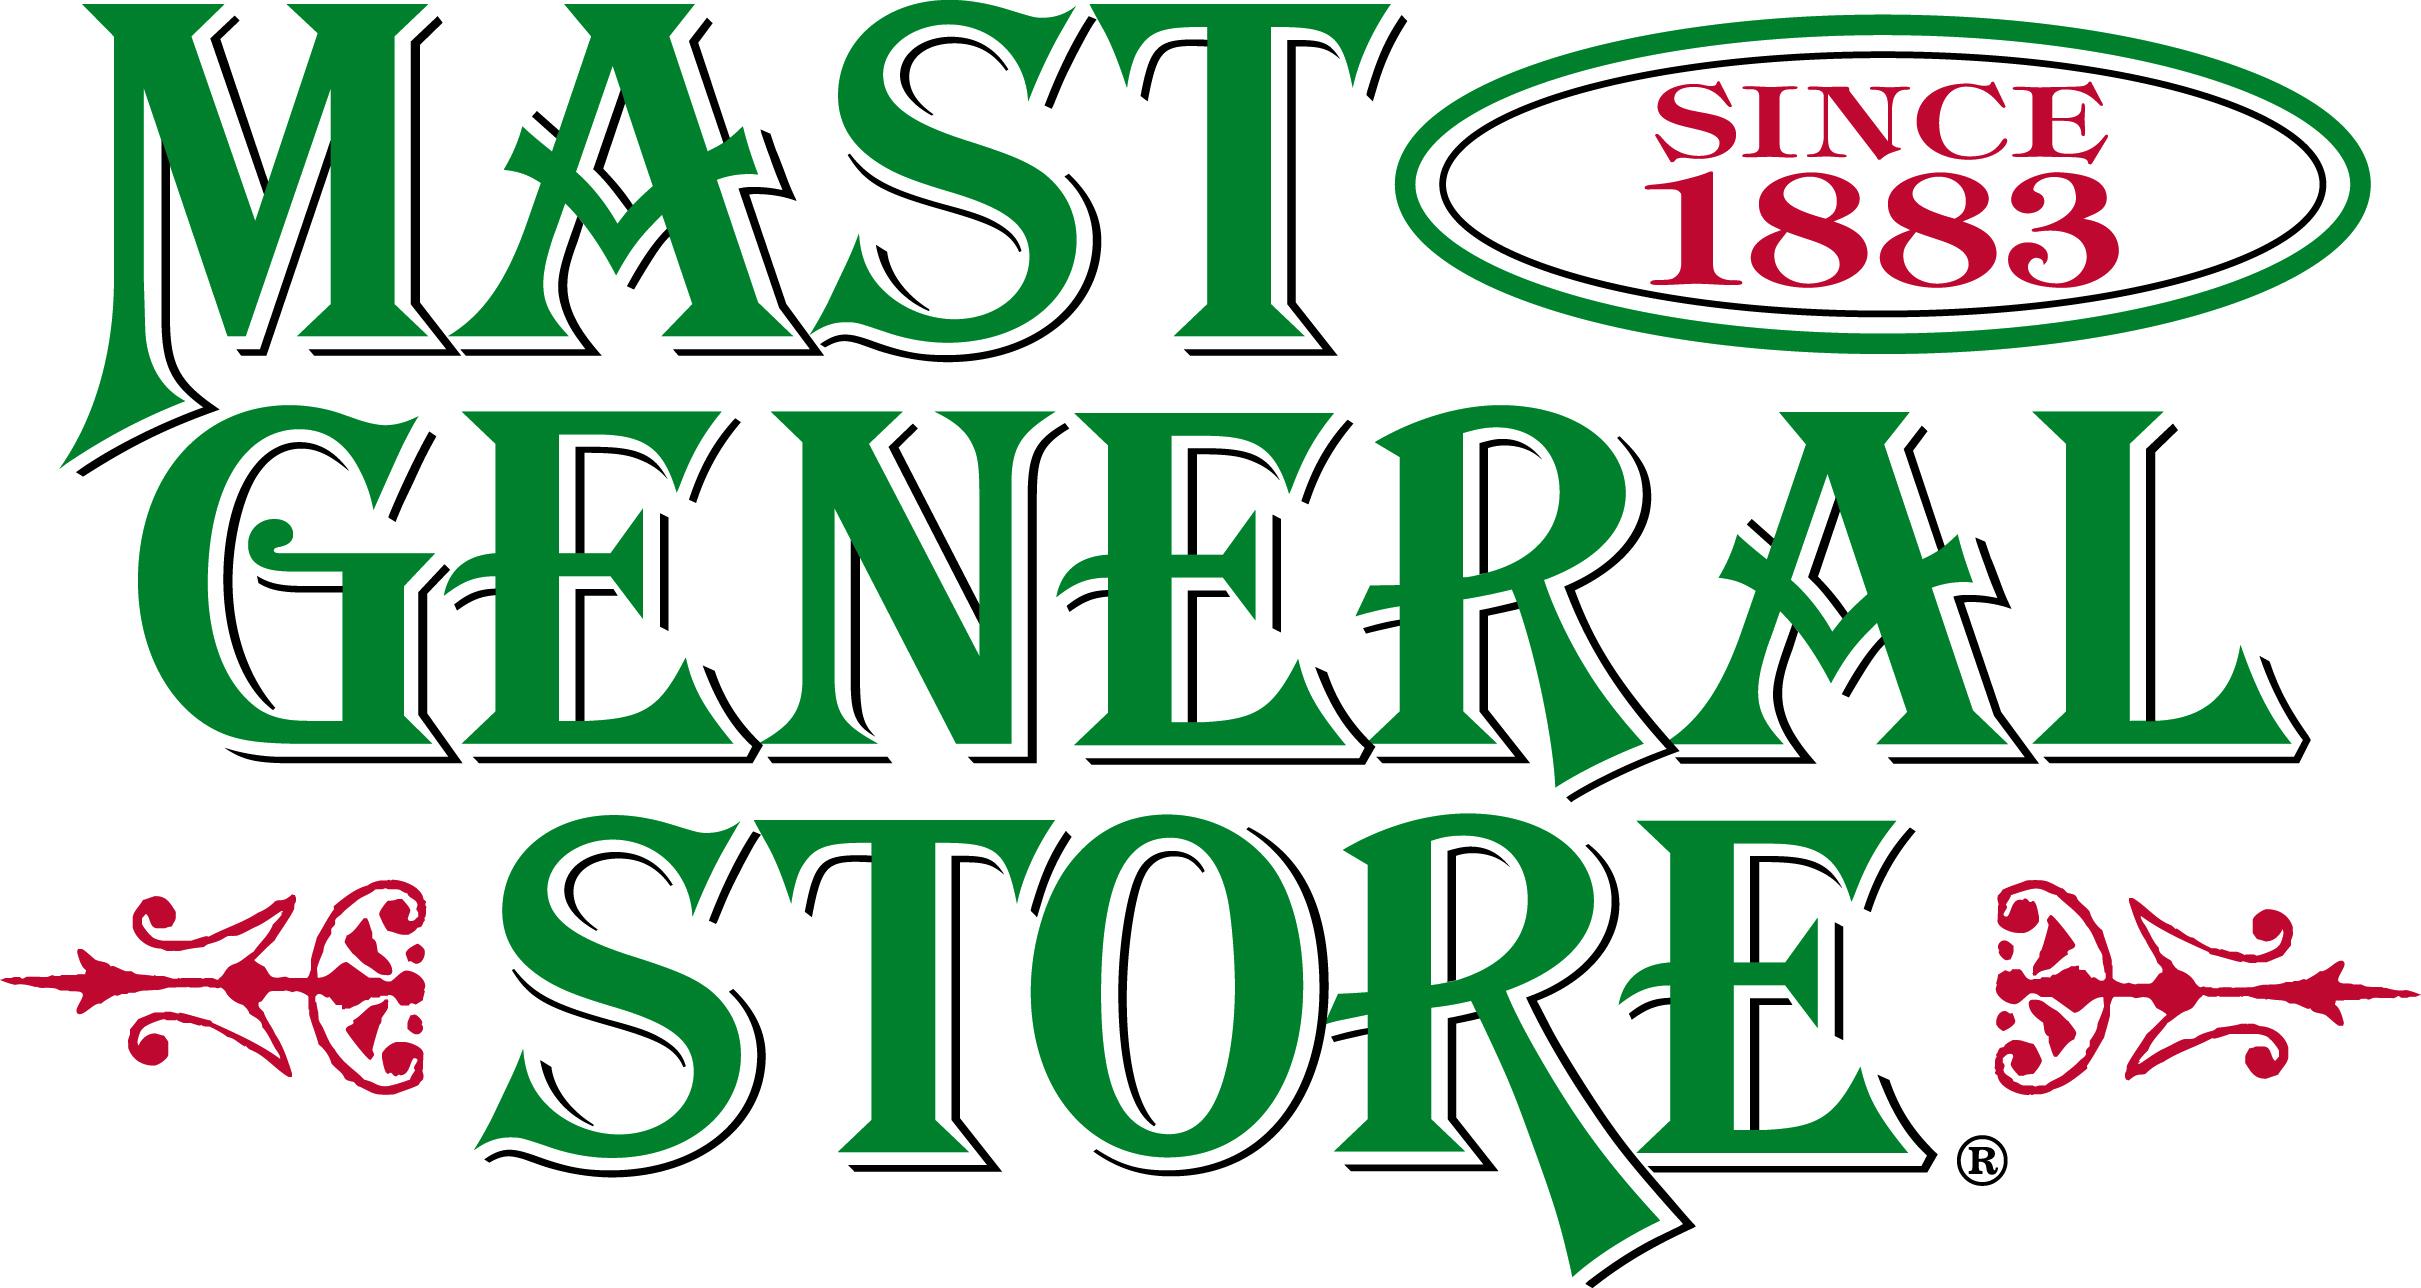 Mast-General-Store.jpg